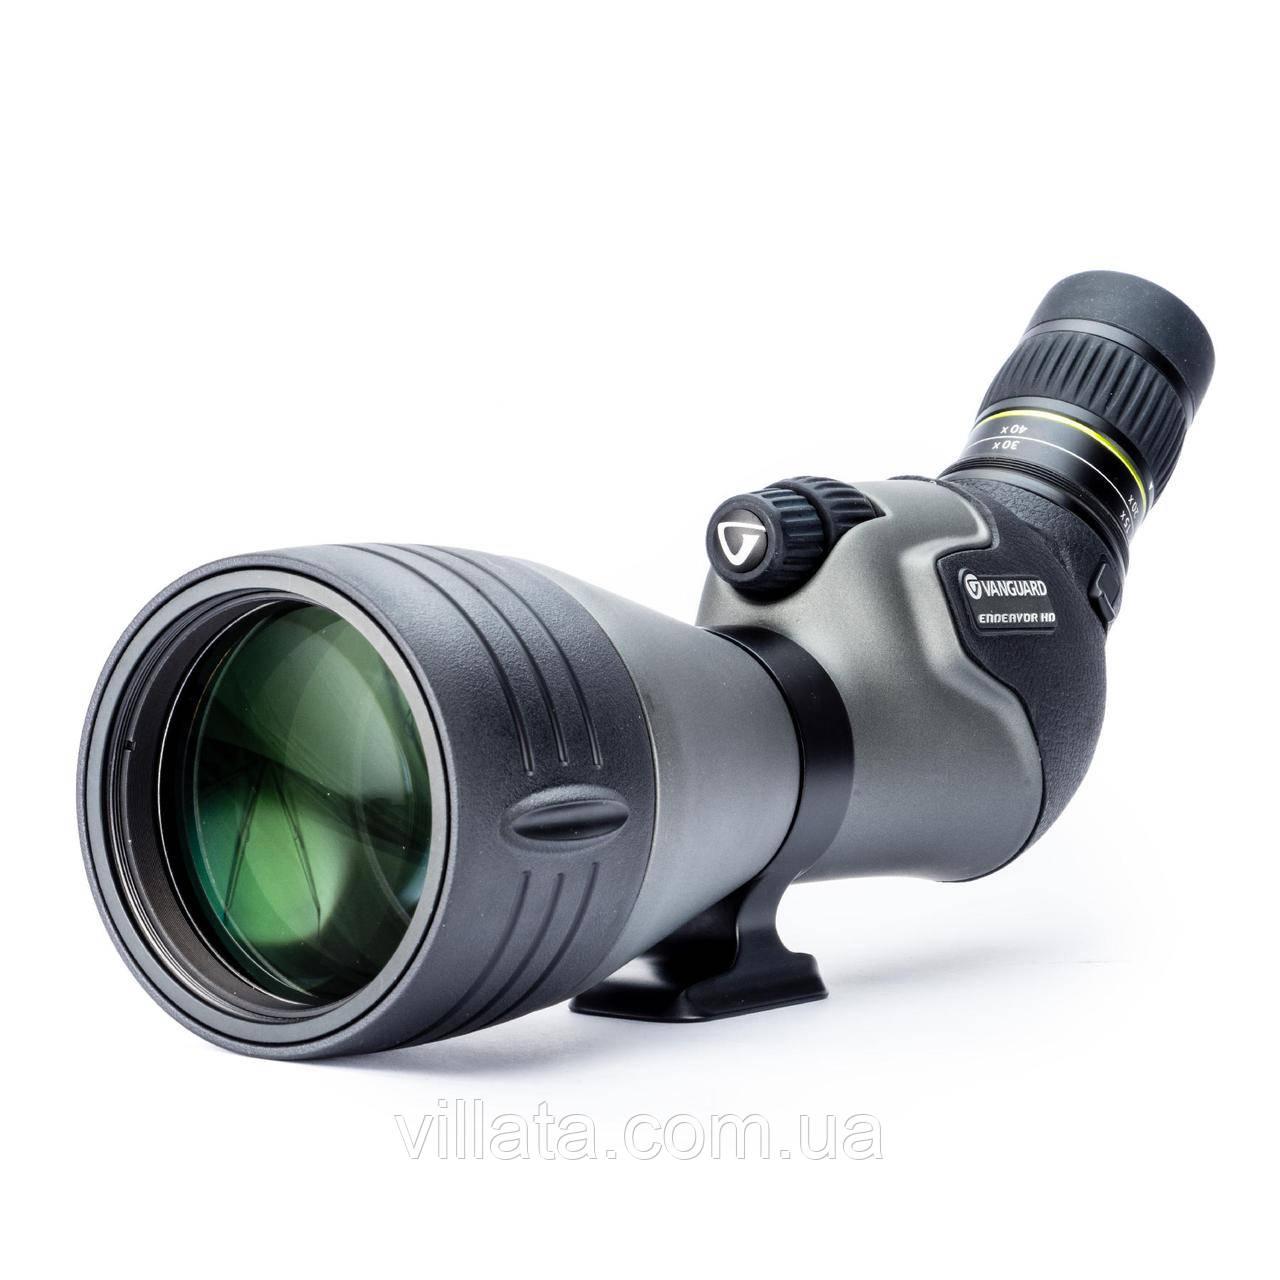 Підзорна труба Vanguard Endeavor HD 82A 20-60x82/45 WP (Endeavor HD 82A)